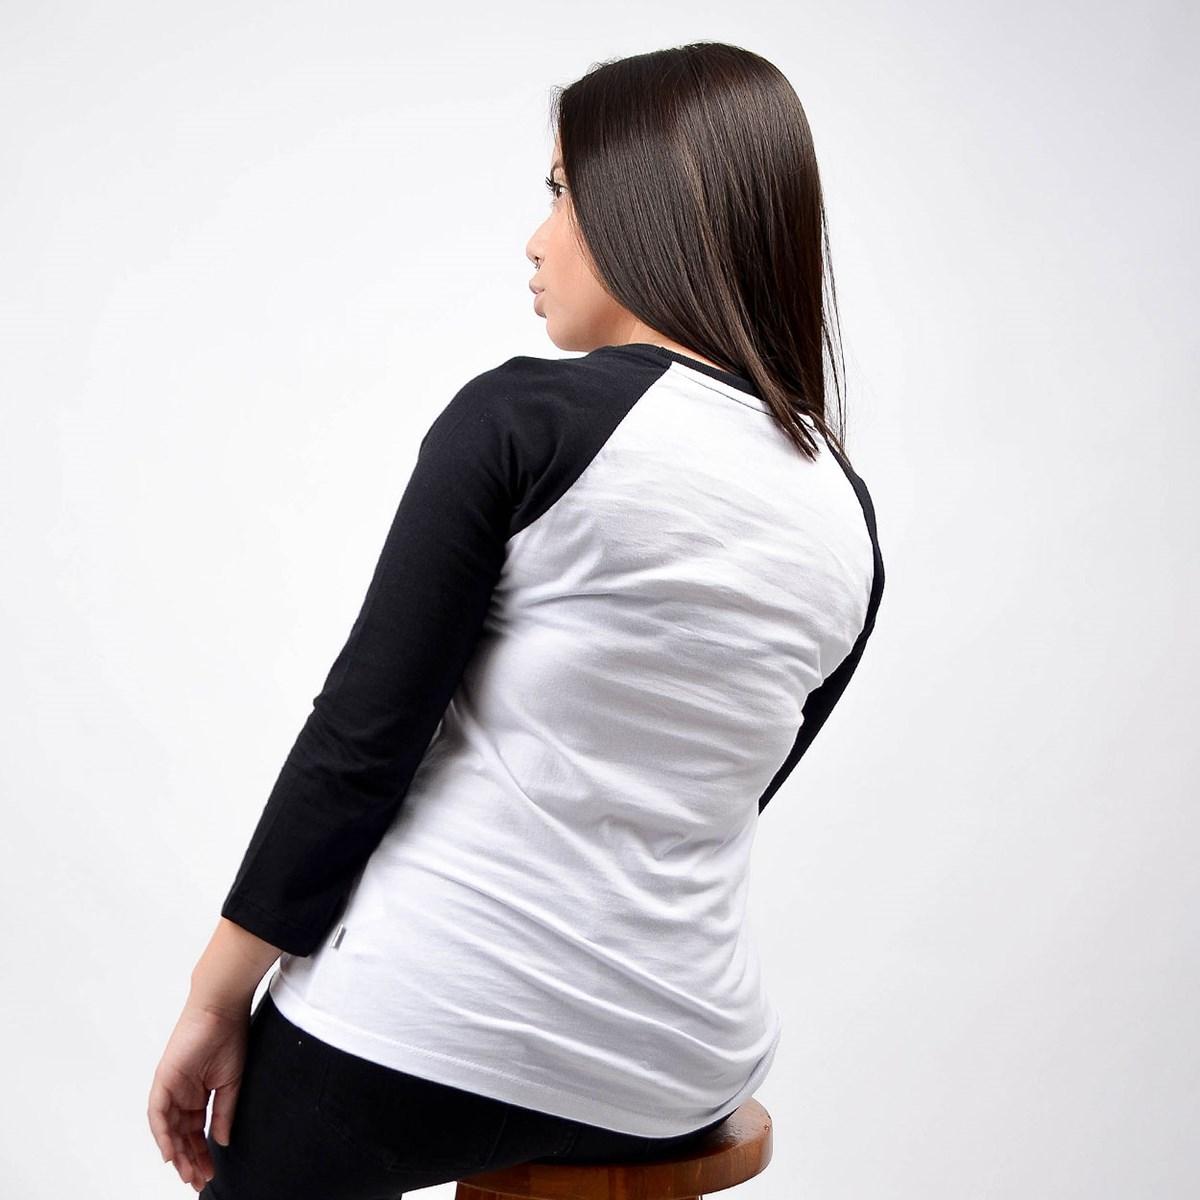 Camiseta Vans Feminina Flying Raglan V White Black VN0A4N52YB2